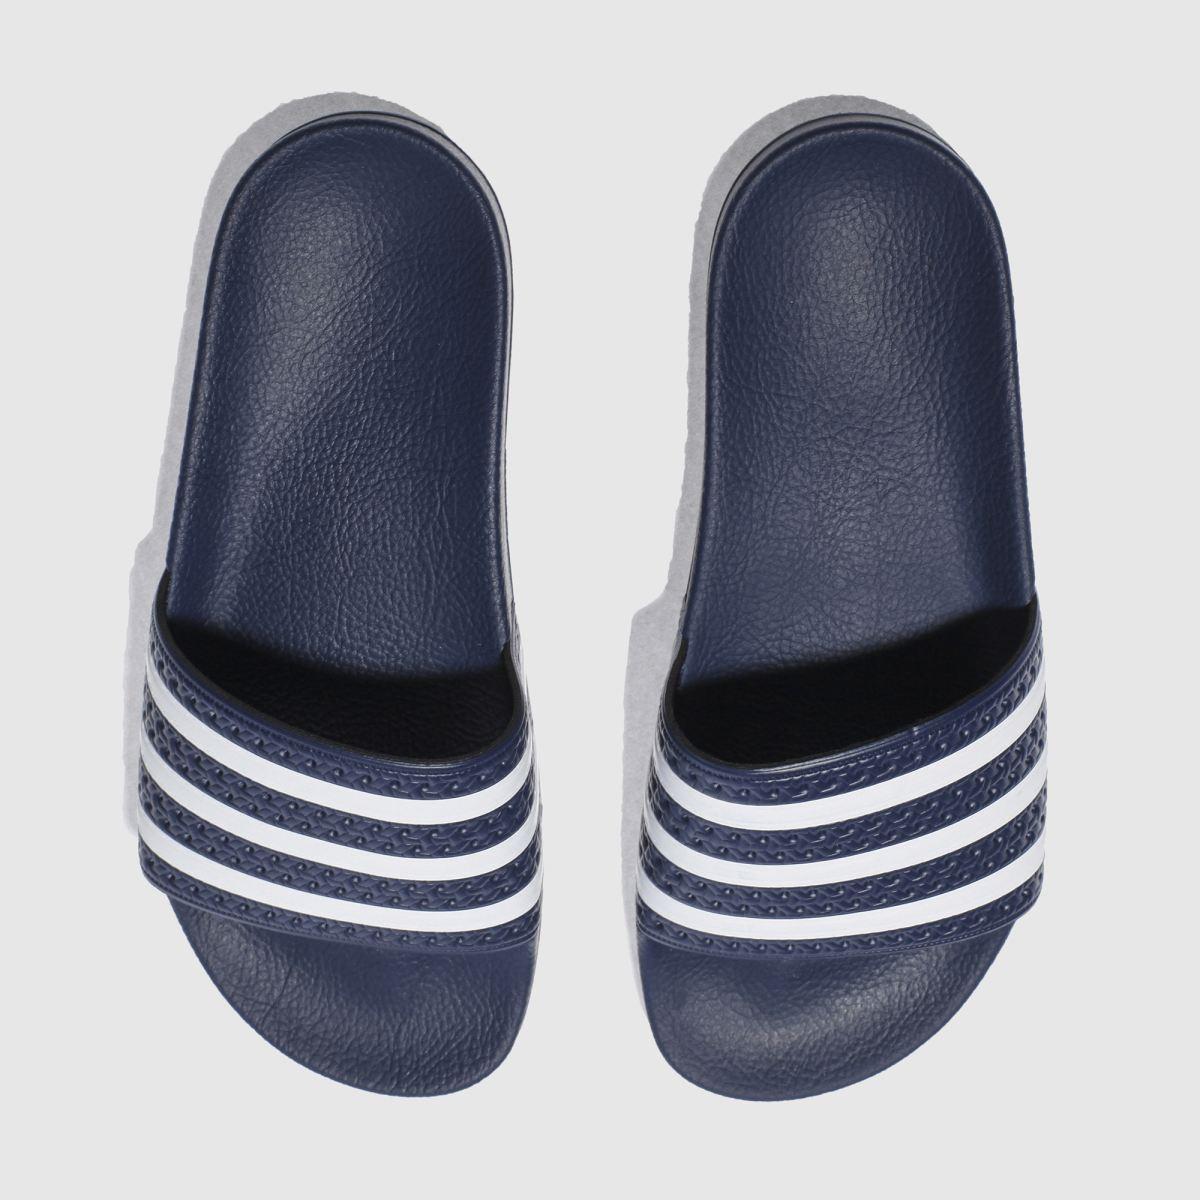 adidas navy adilette sandals